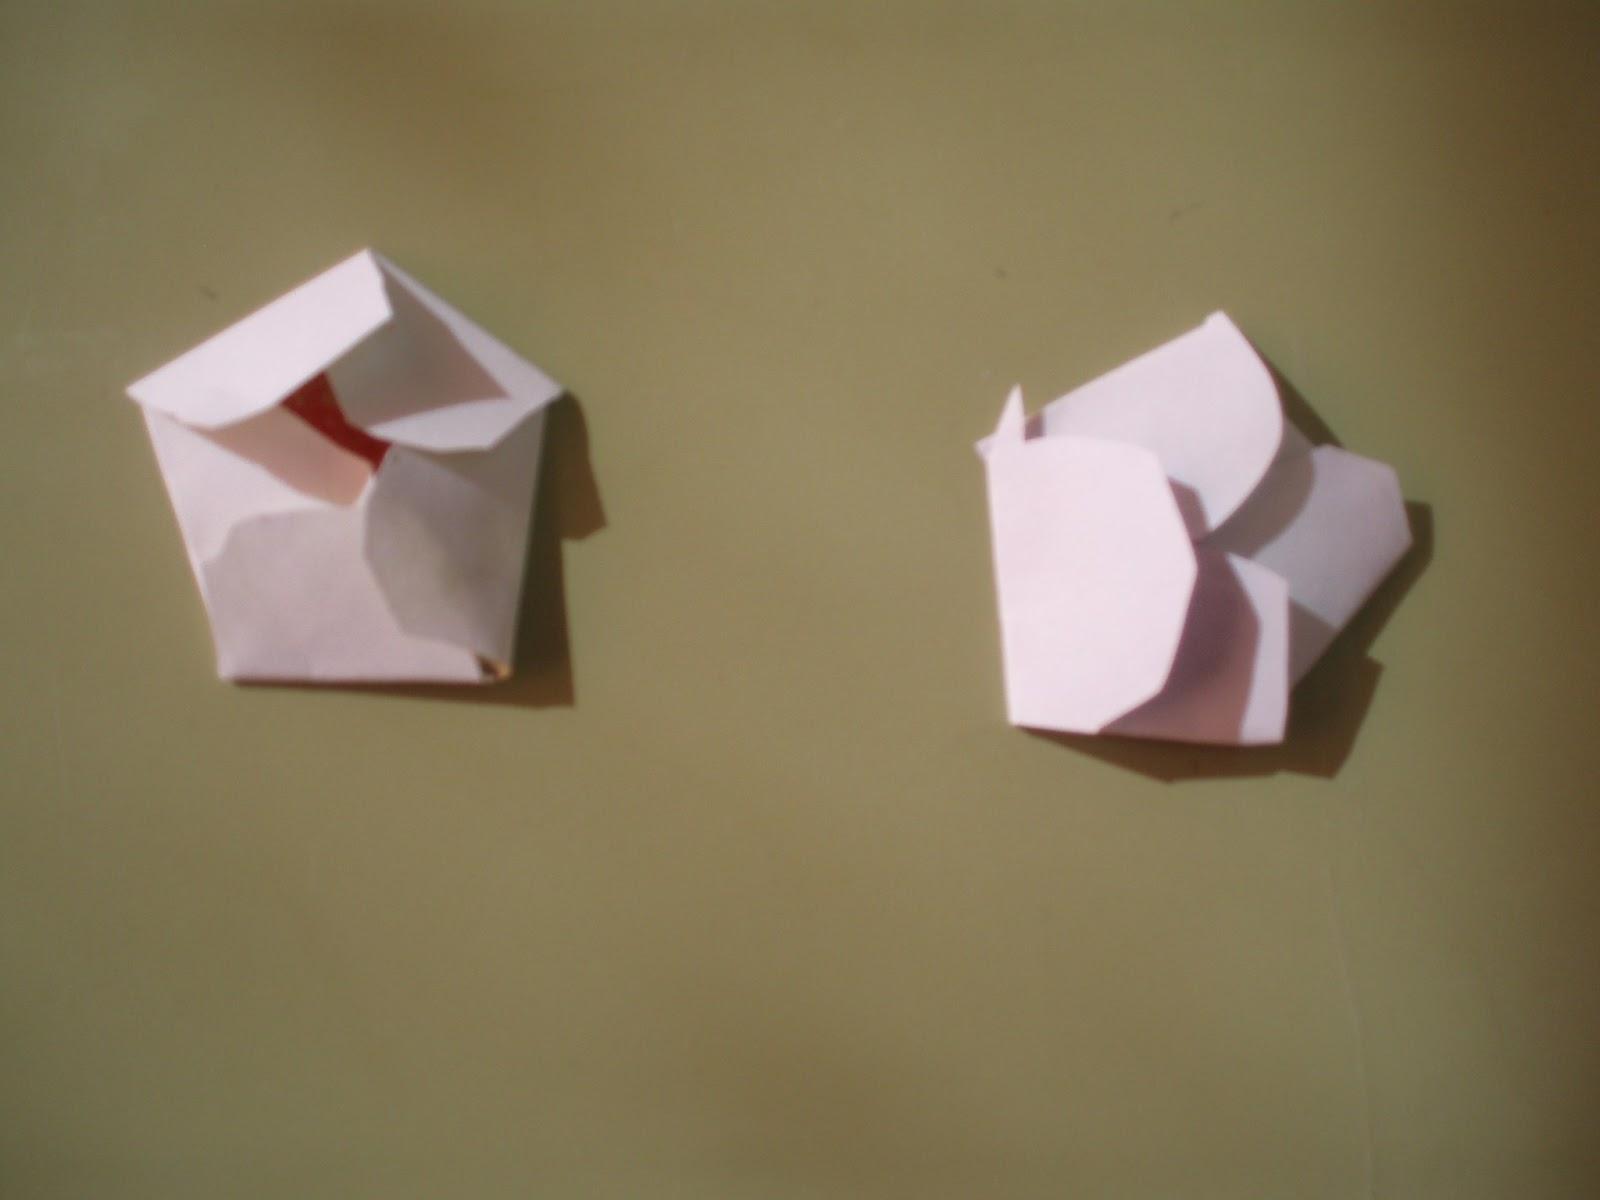 Como doblar servilletas de tela con flor de loto auto - Como doblar servilletas de tela ...